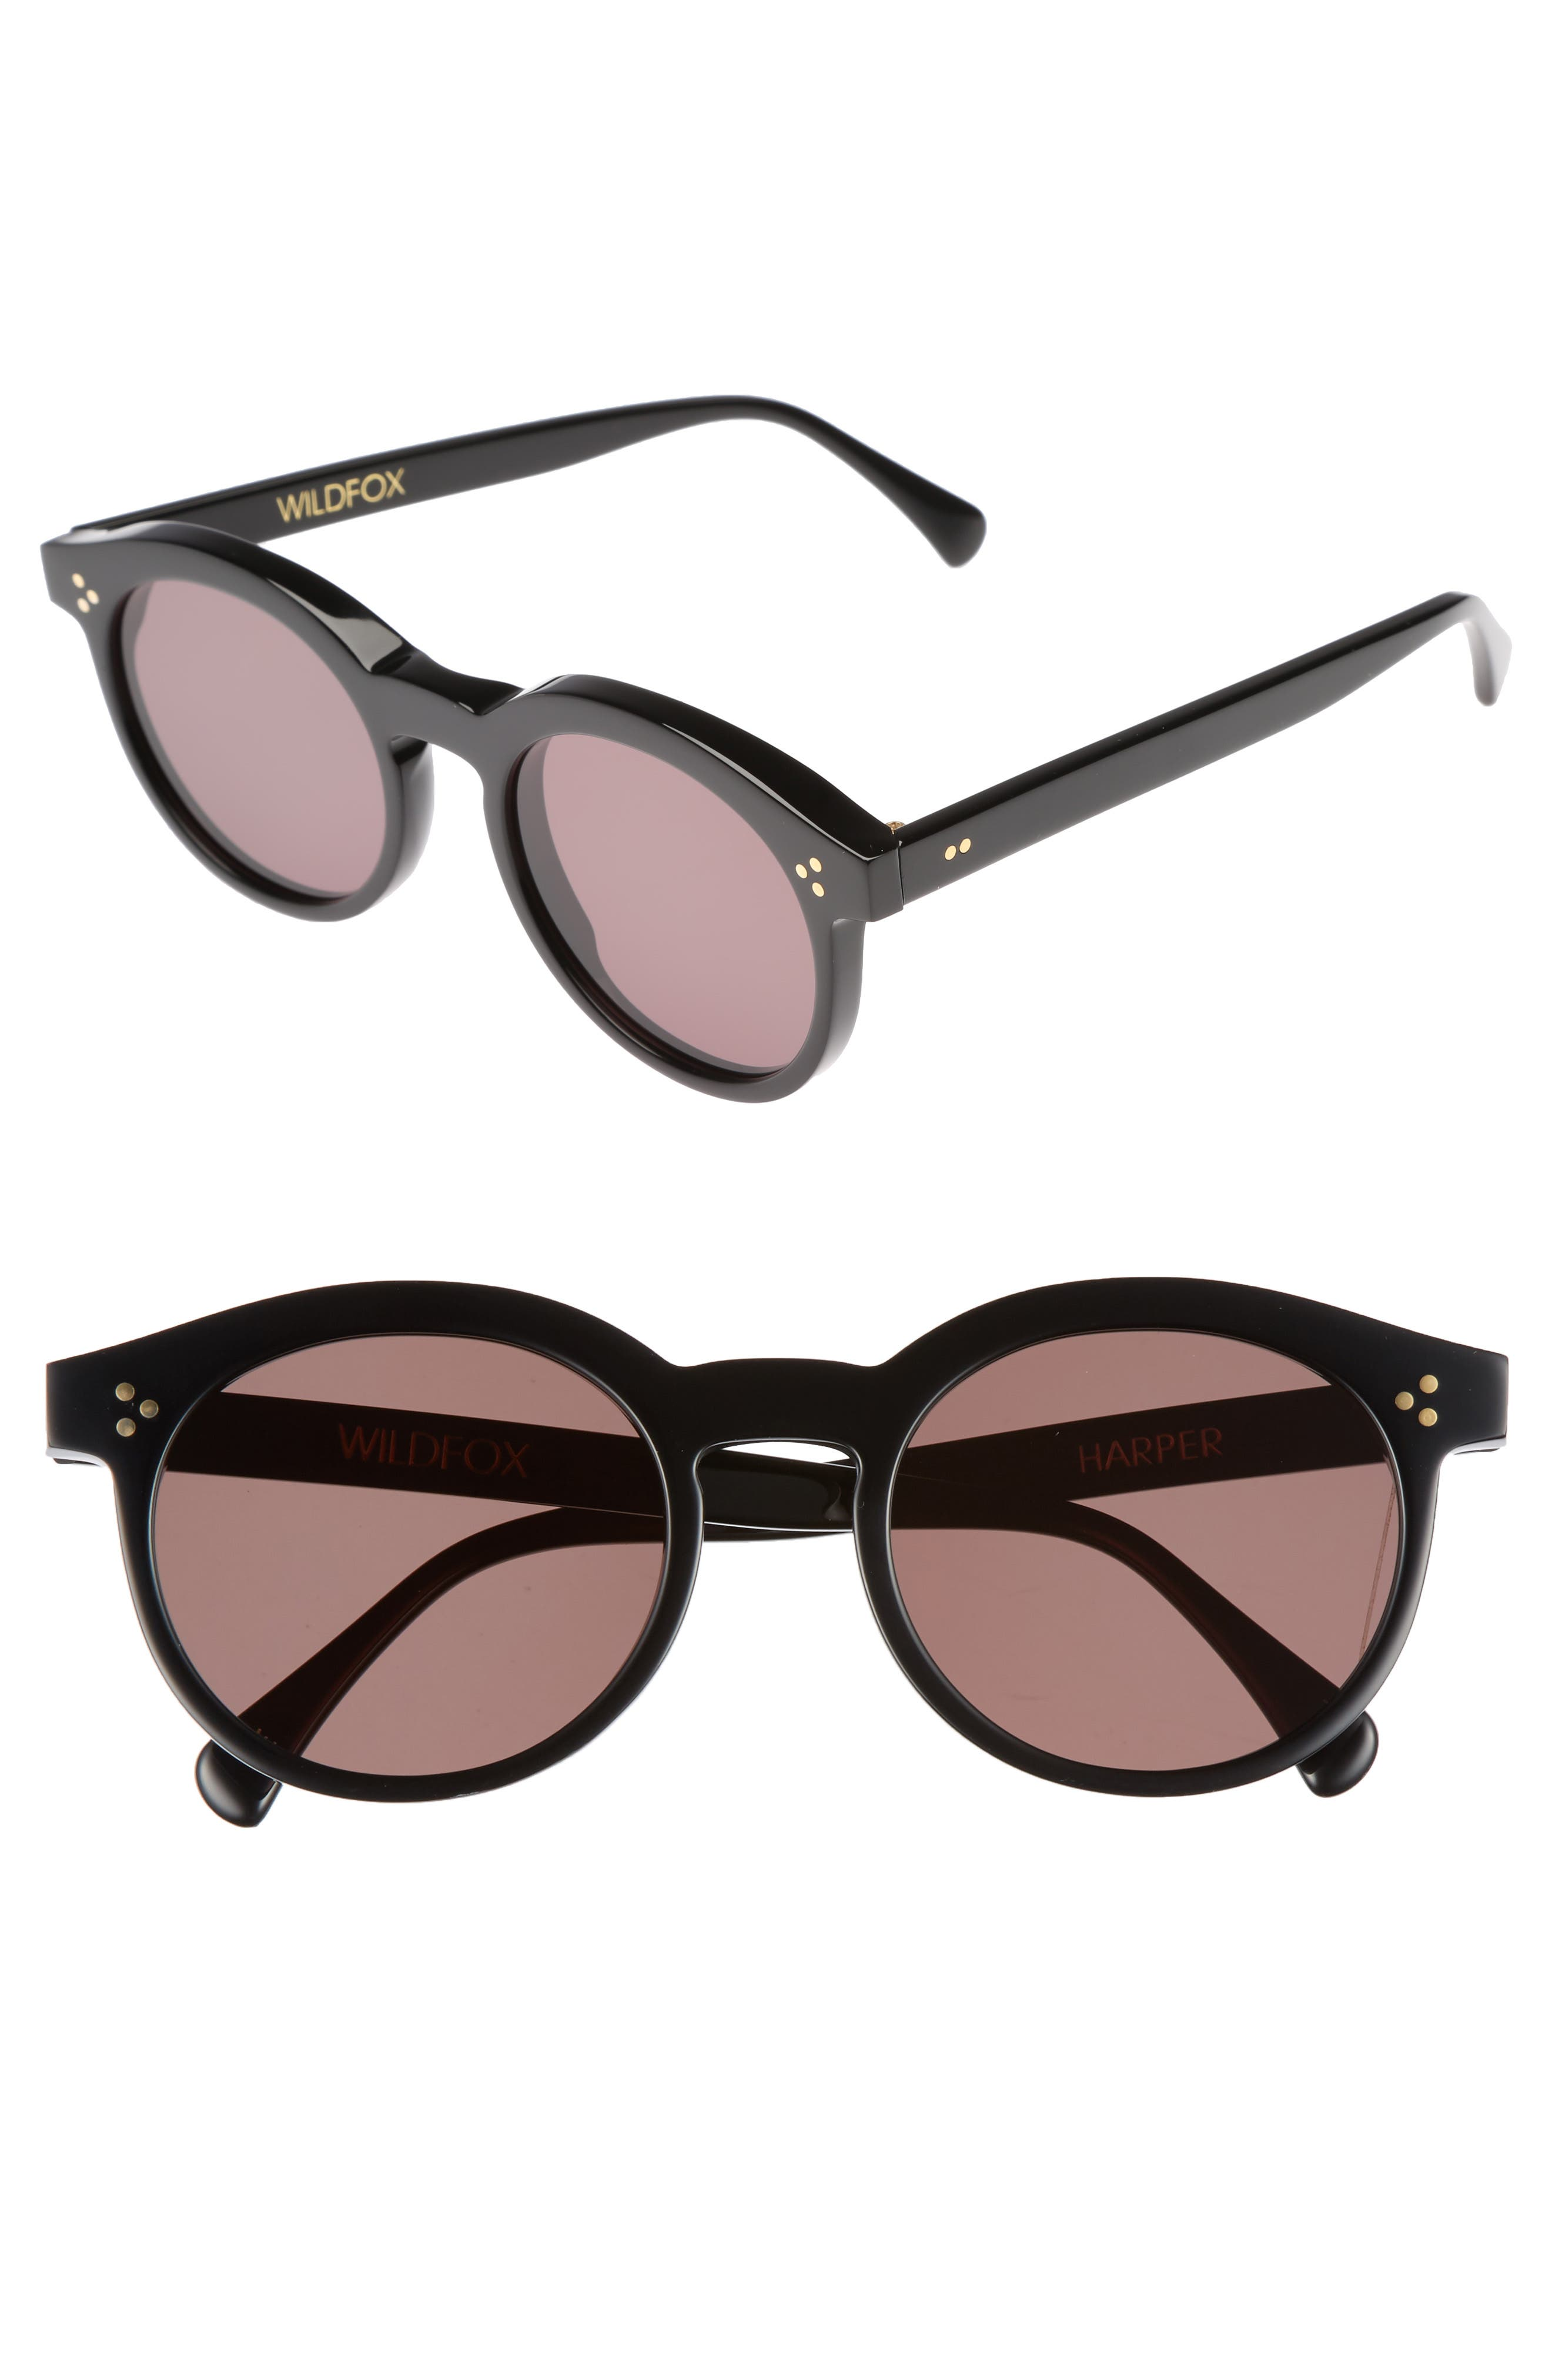 Harper Zero 53mm Round Keyhole Sunglasses,                             Main thumbnail 1, color,                             001